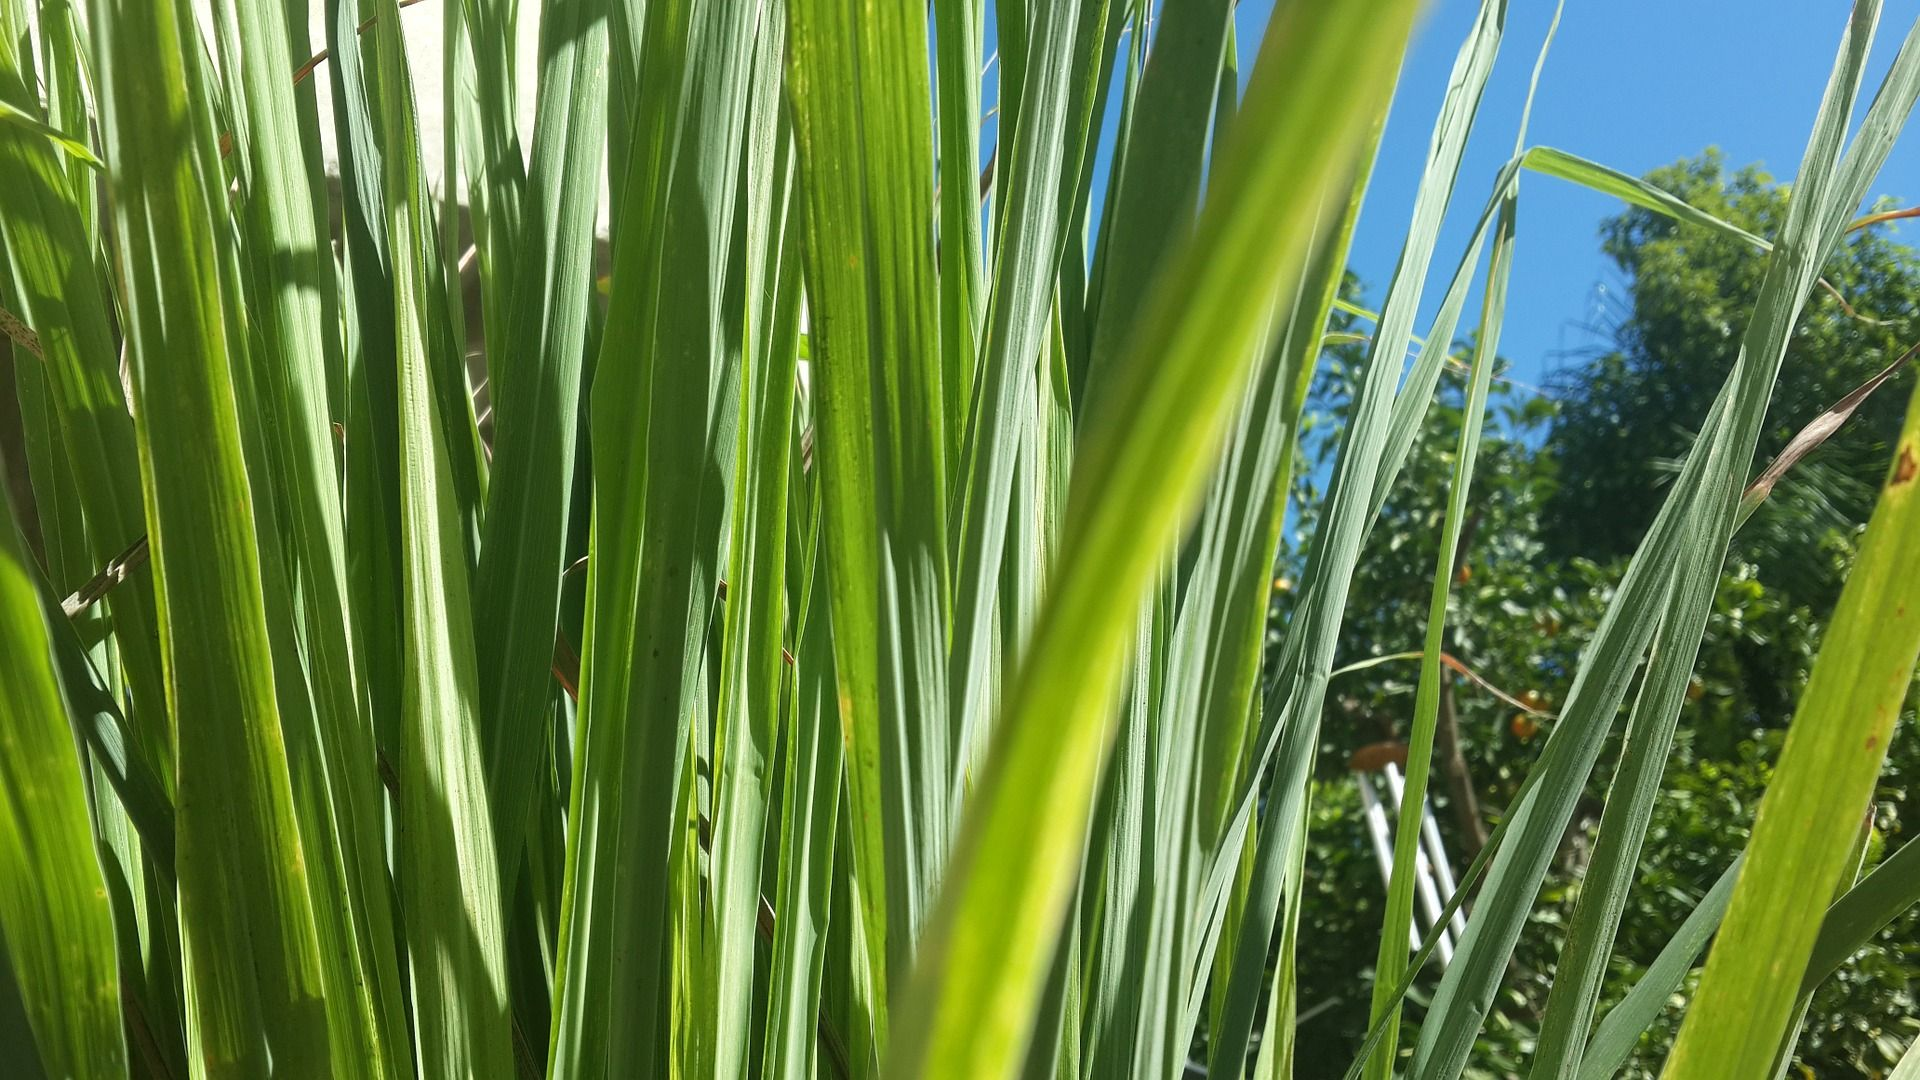 Lemongrass Is A Lovely Fragrant Plant That Is Easy To Take Care Of Lemongrass Has A Lemon Citrus Cent In 2020 Lemongrass Plant Mosquito Repelling Plants Lemon Grass